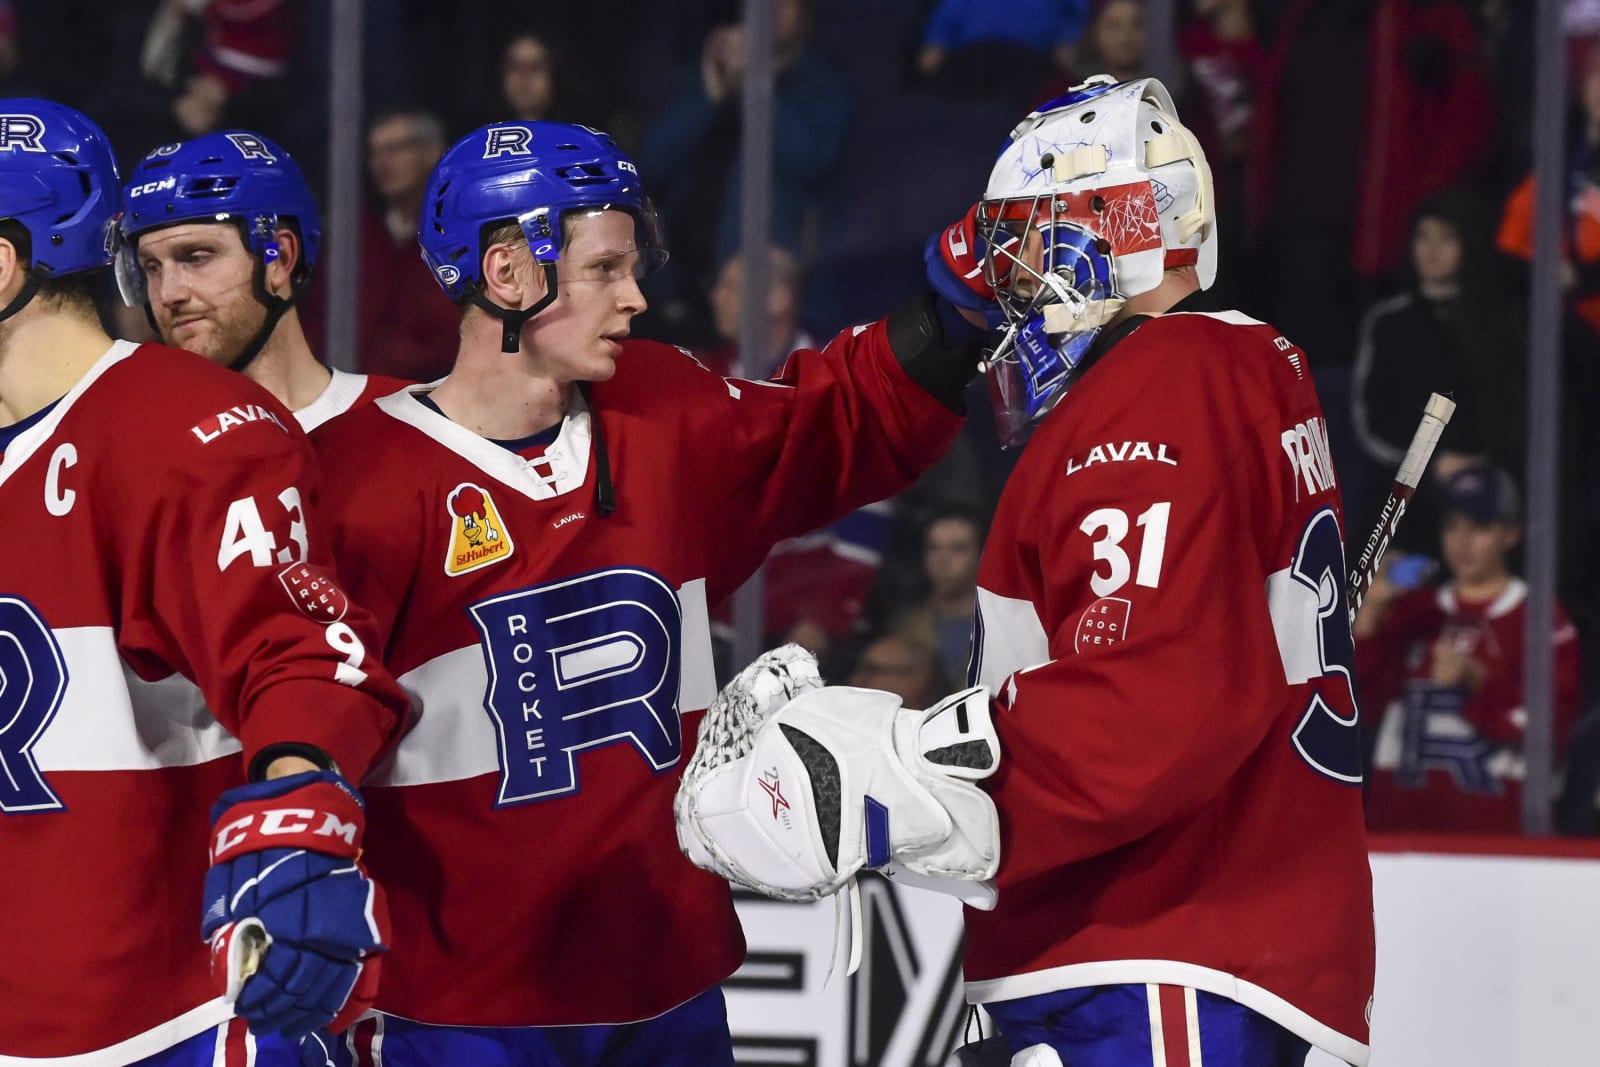 Montreal Canadiens, Laval Rocket